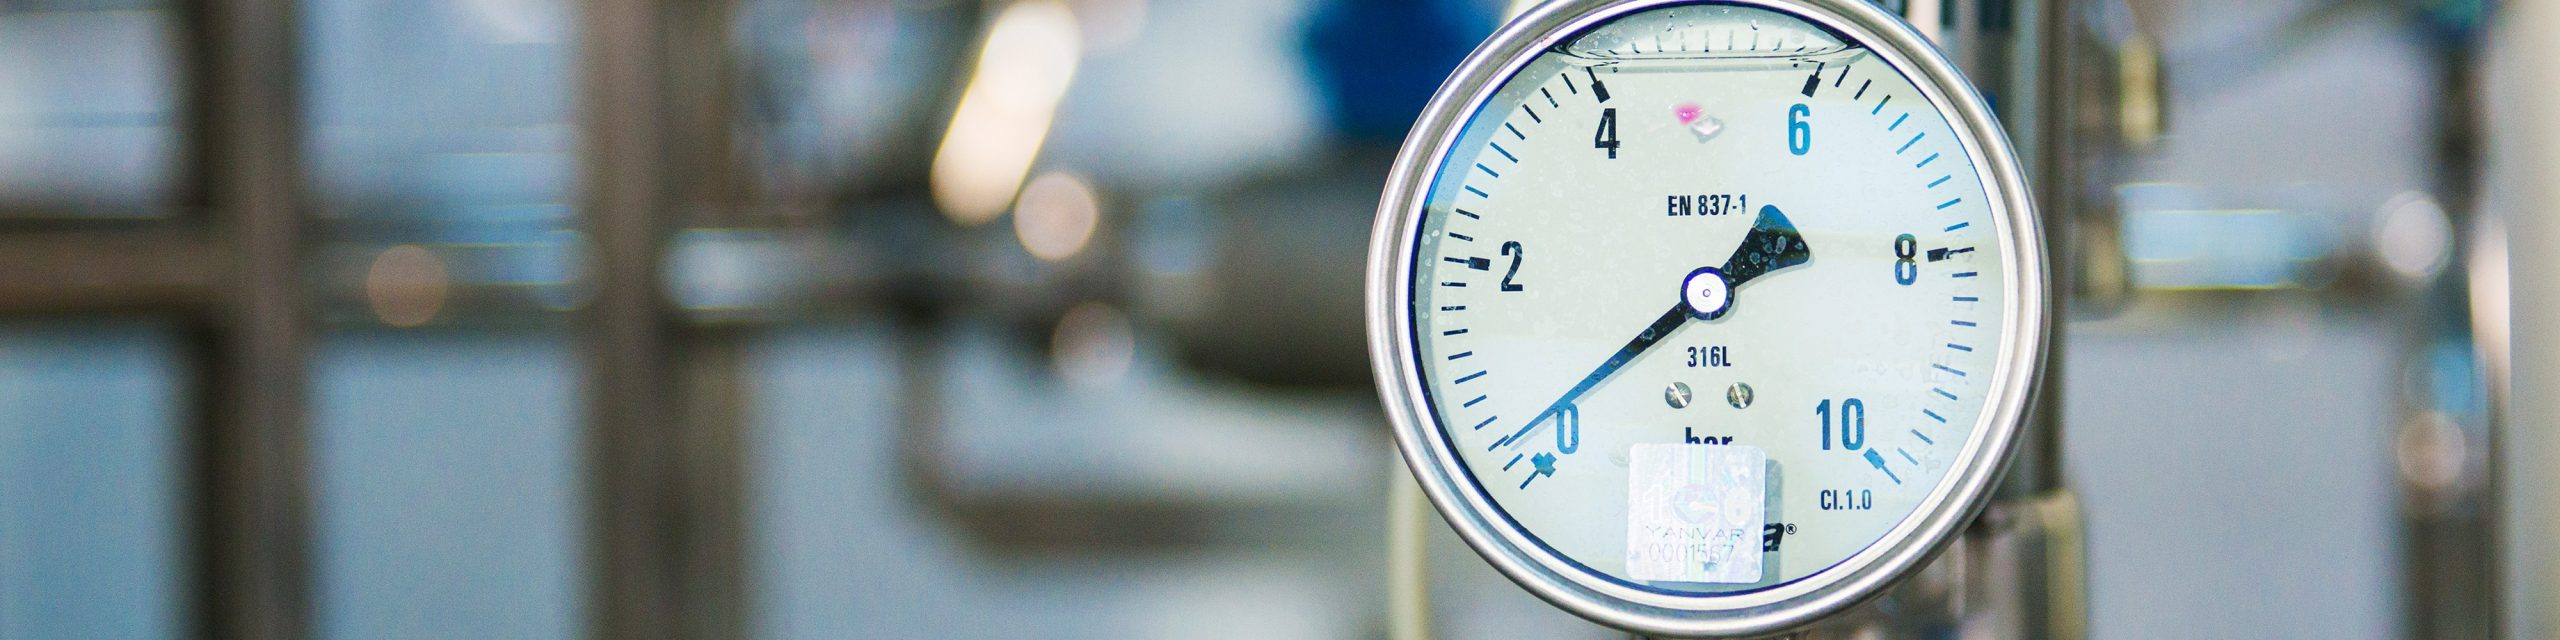 regulators and gas handling equipment